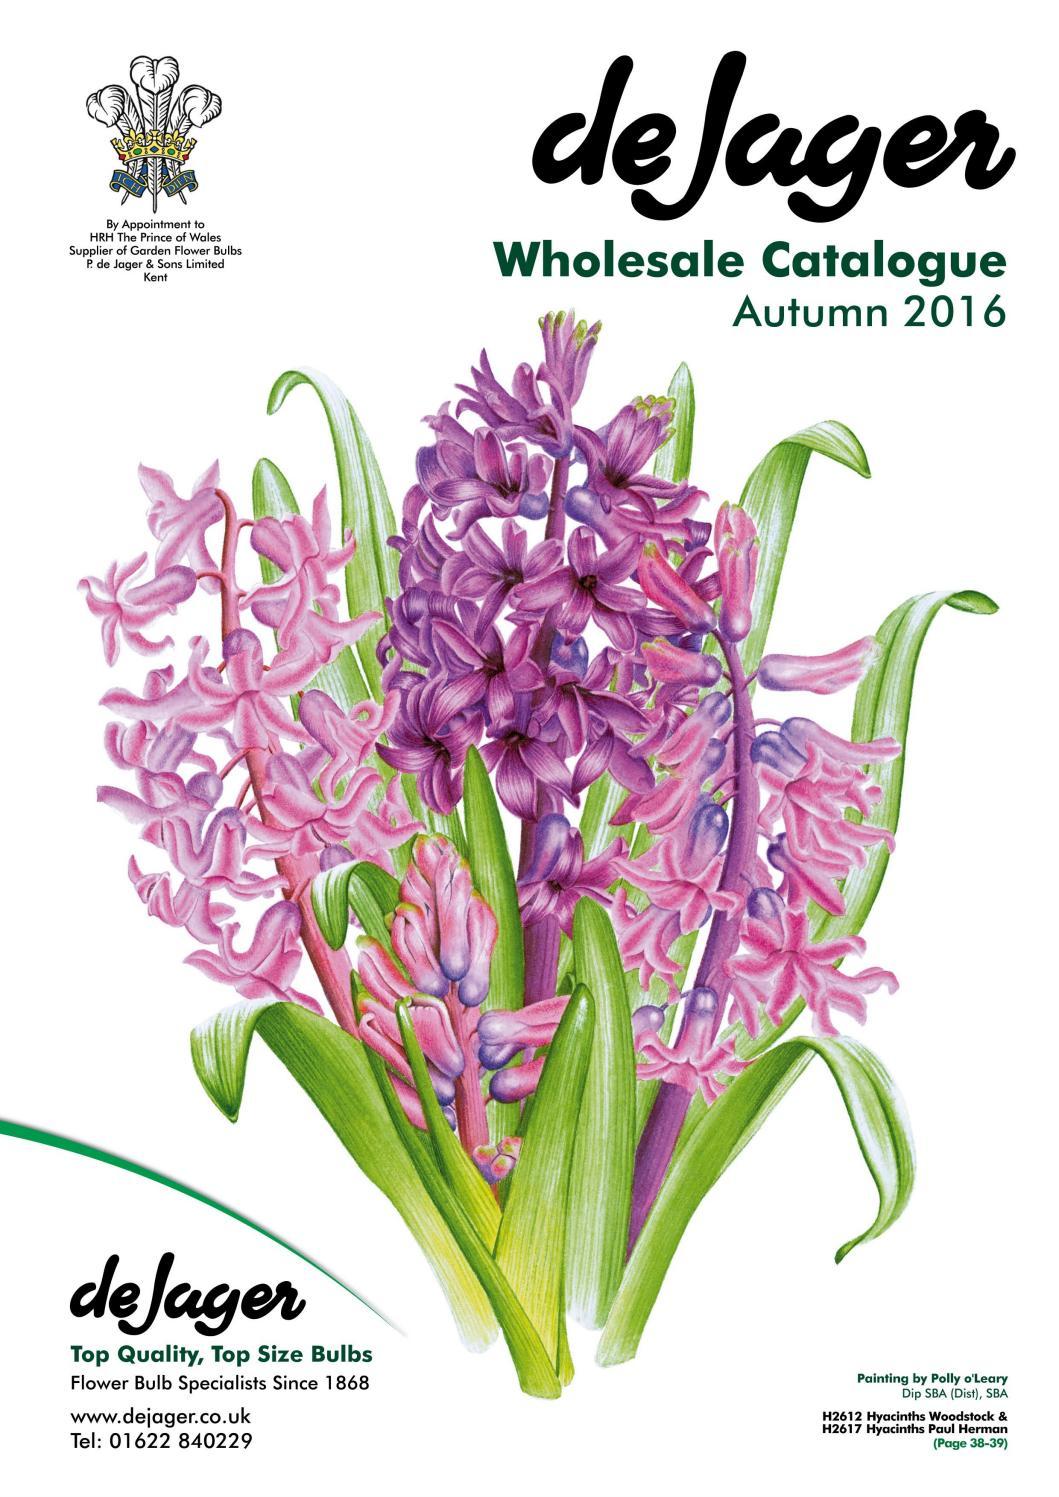 De jager bulbs wholesale catalogue autumn 2016 by emma simpson issuu mightylinksfo